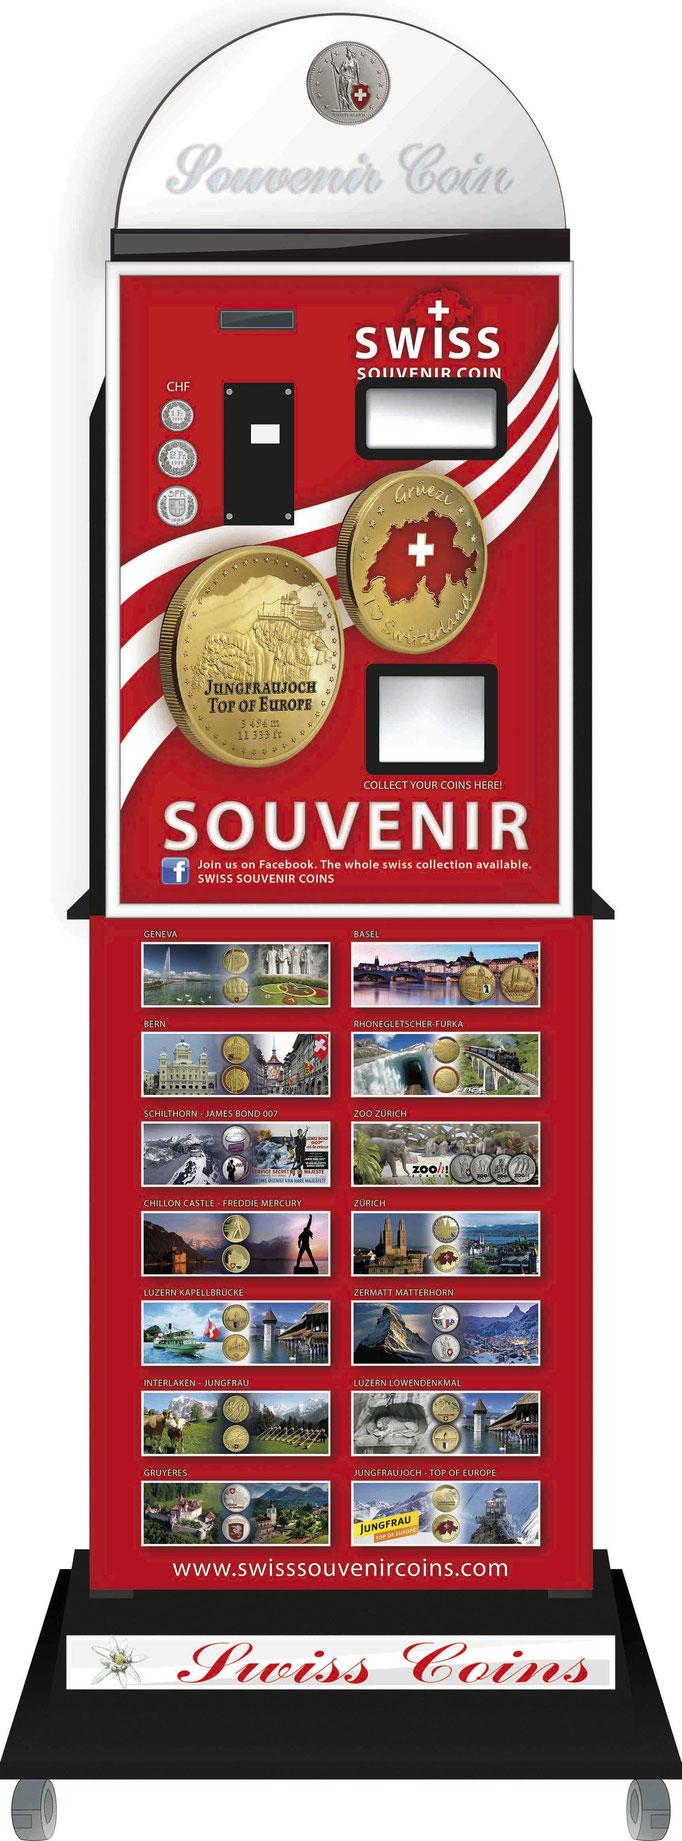 souvenir vending Maschine Jungfrau